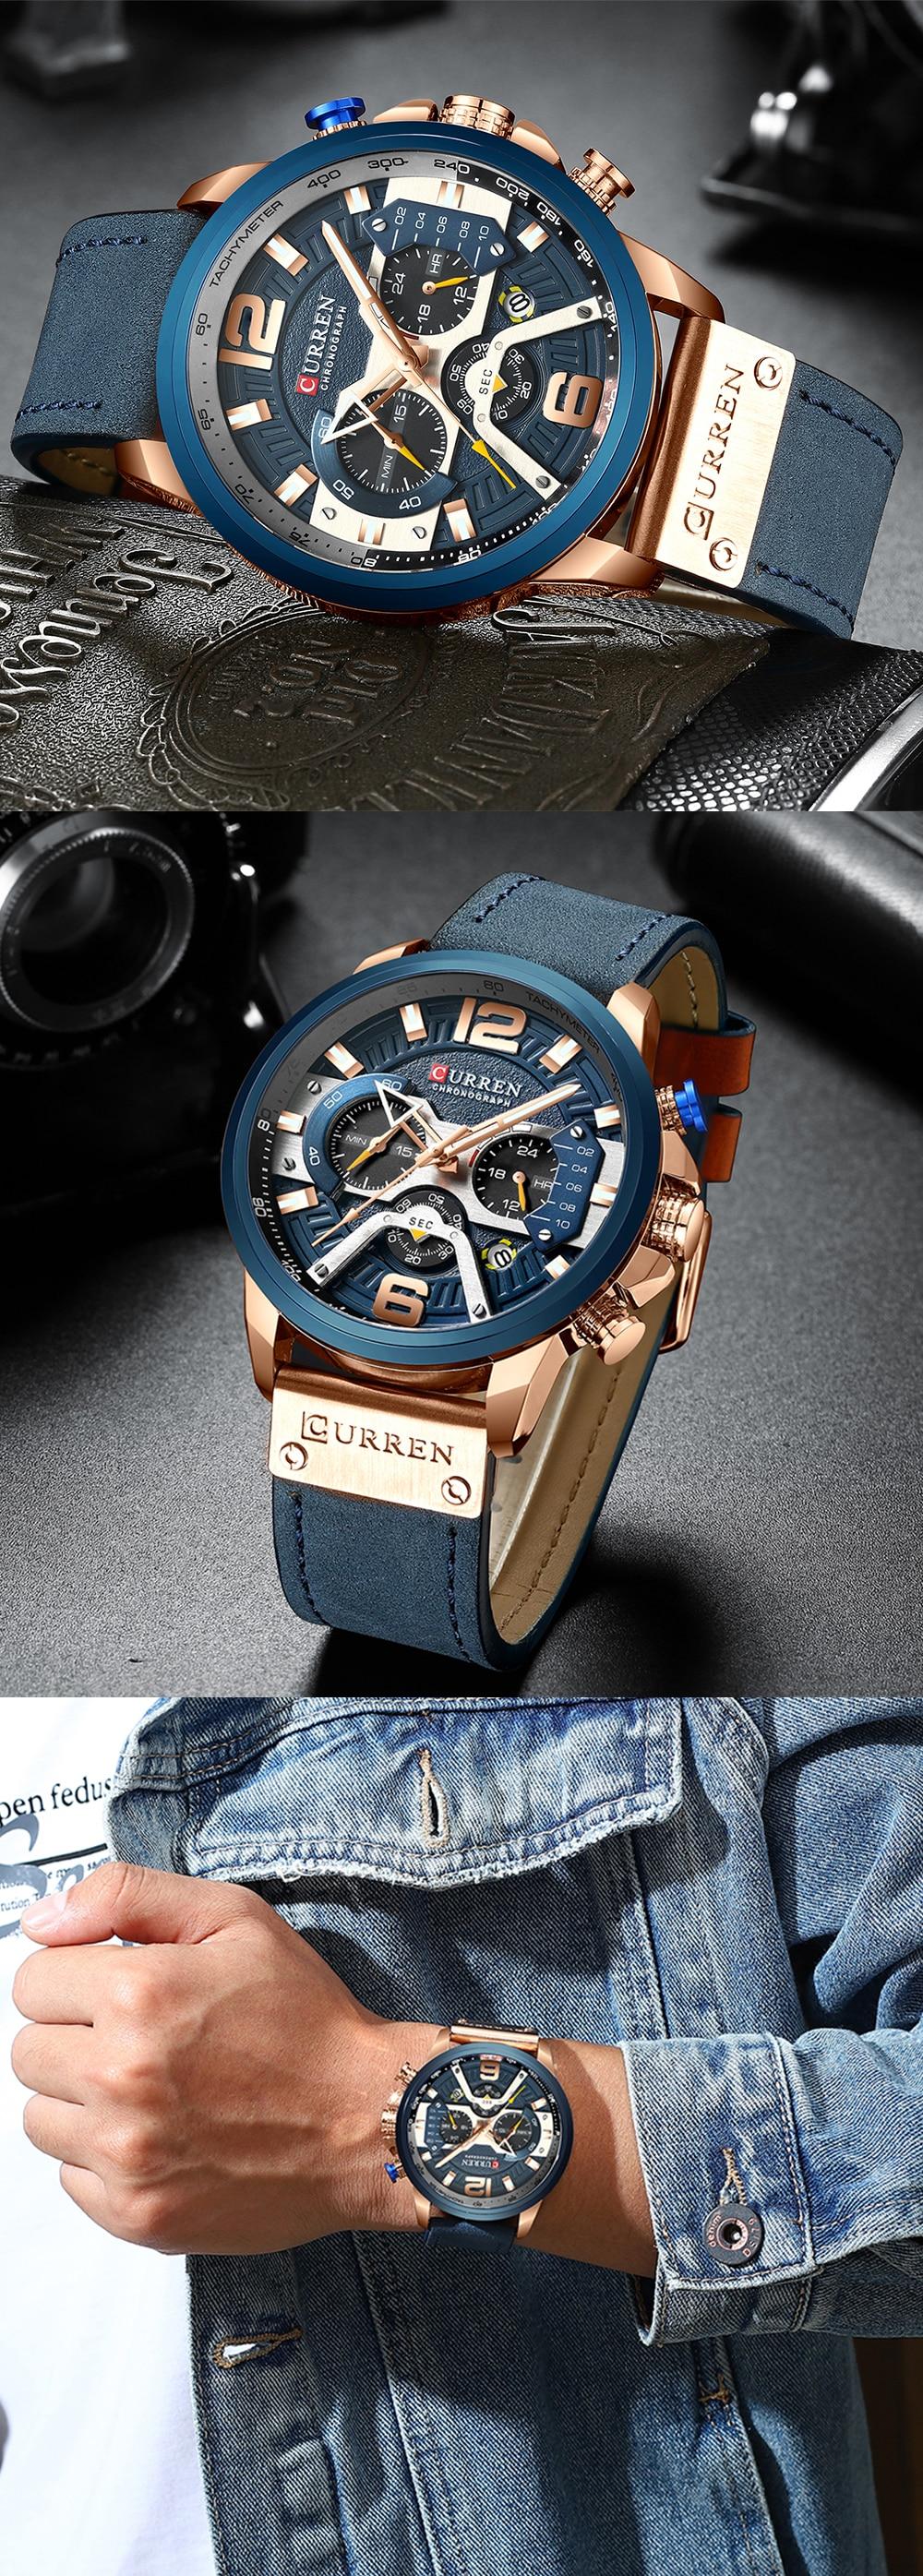 HTB1SIh5KwHqK1RjSZFgq6y7JXXae CURREN Casual Sport Watches for Men Blue Top Brand Luxury Military Leather Wrist Watch Man Clock Fashion Chronograph Wristwatch